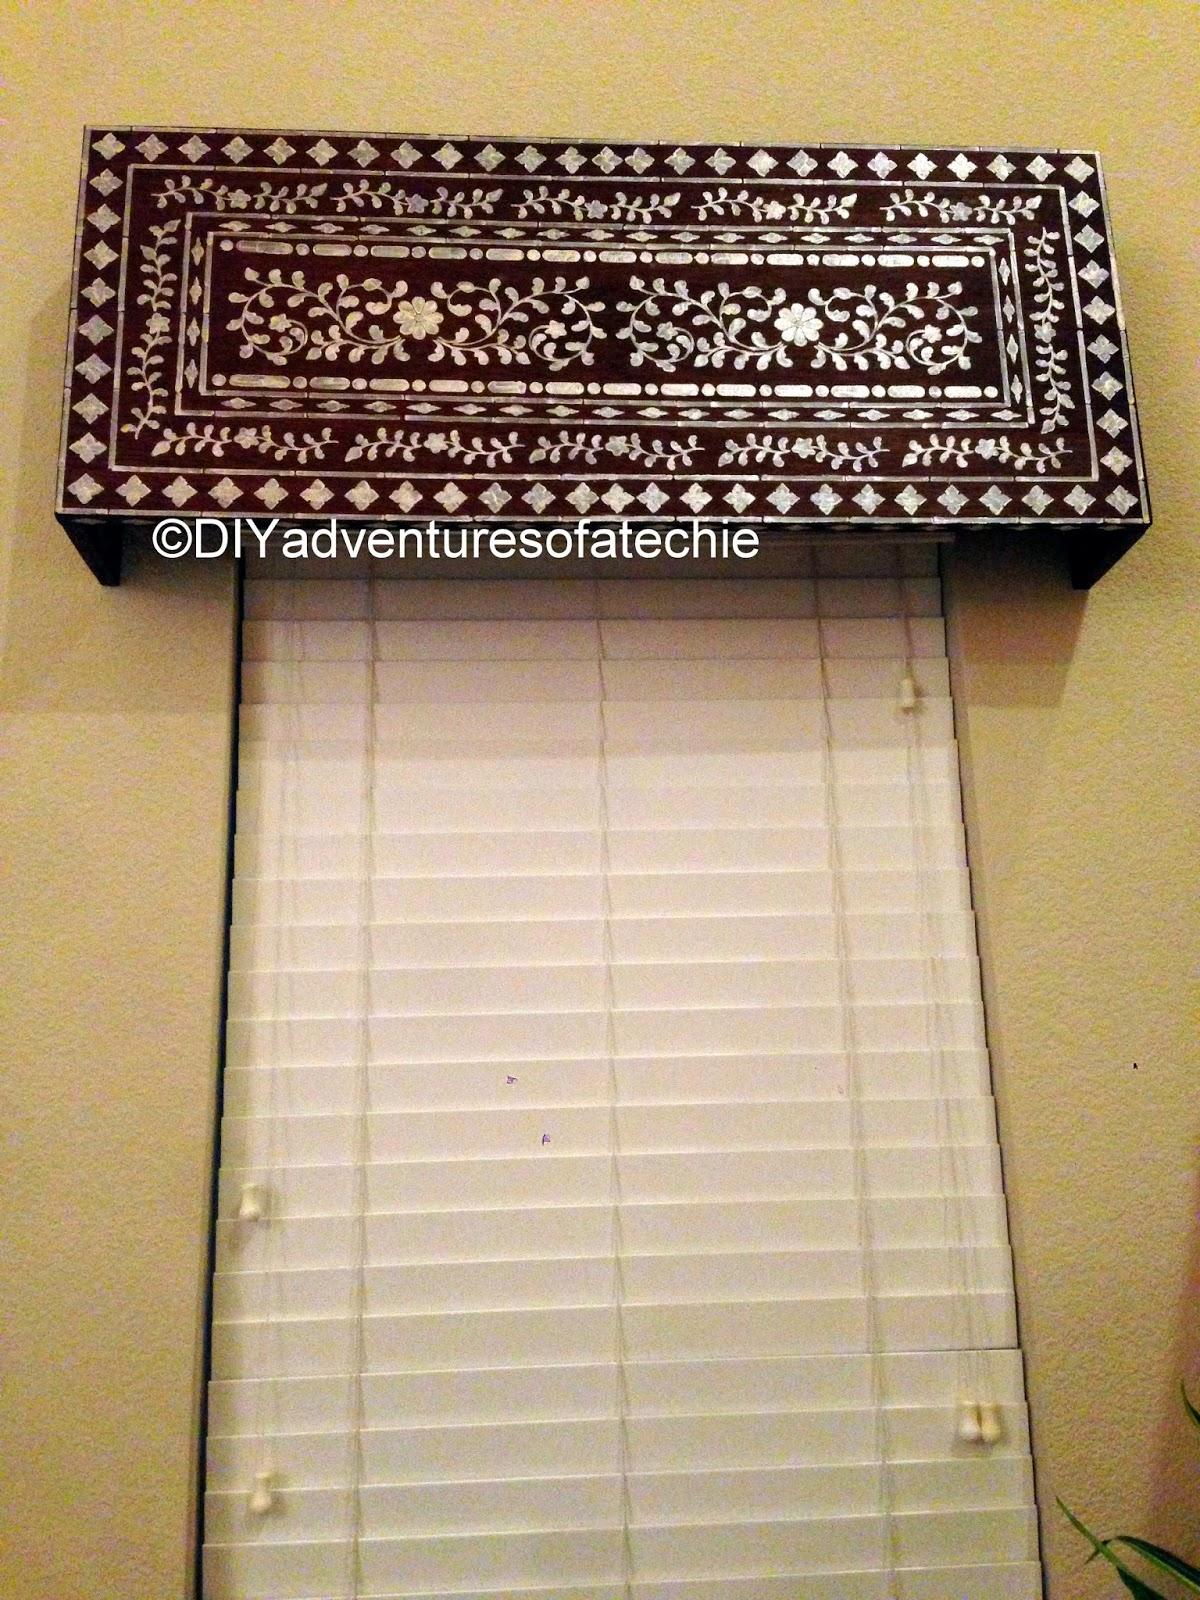 Diy Wood Cornice Indian Inlay Stenciled Window Cornice Techies Diy Adventures